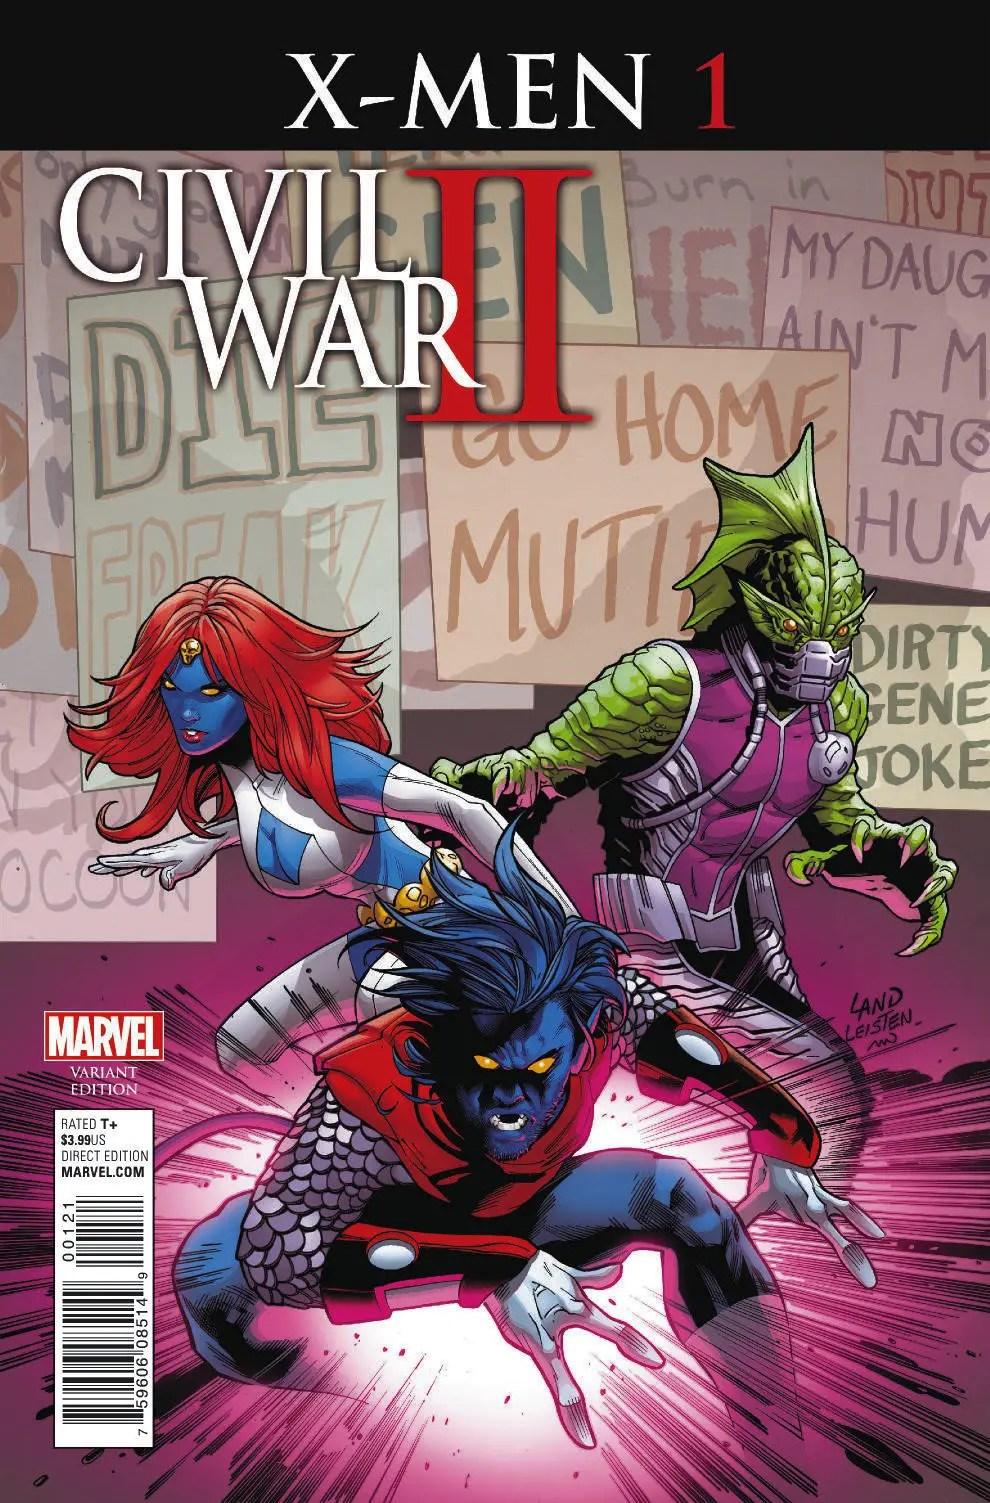 Civil_War_II_X-Men_1_Land_Variant